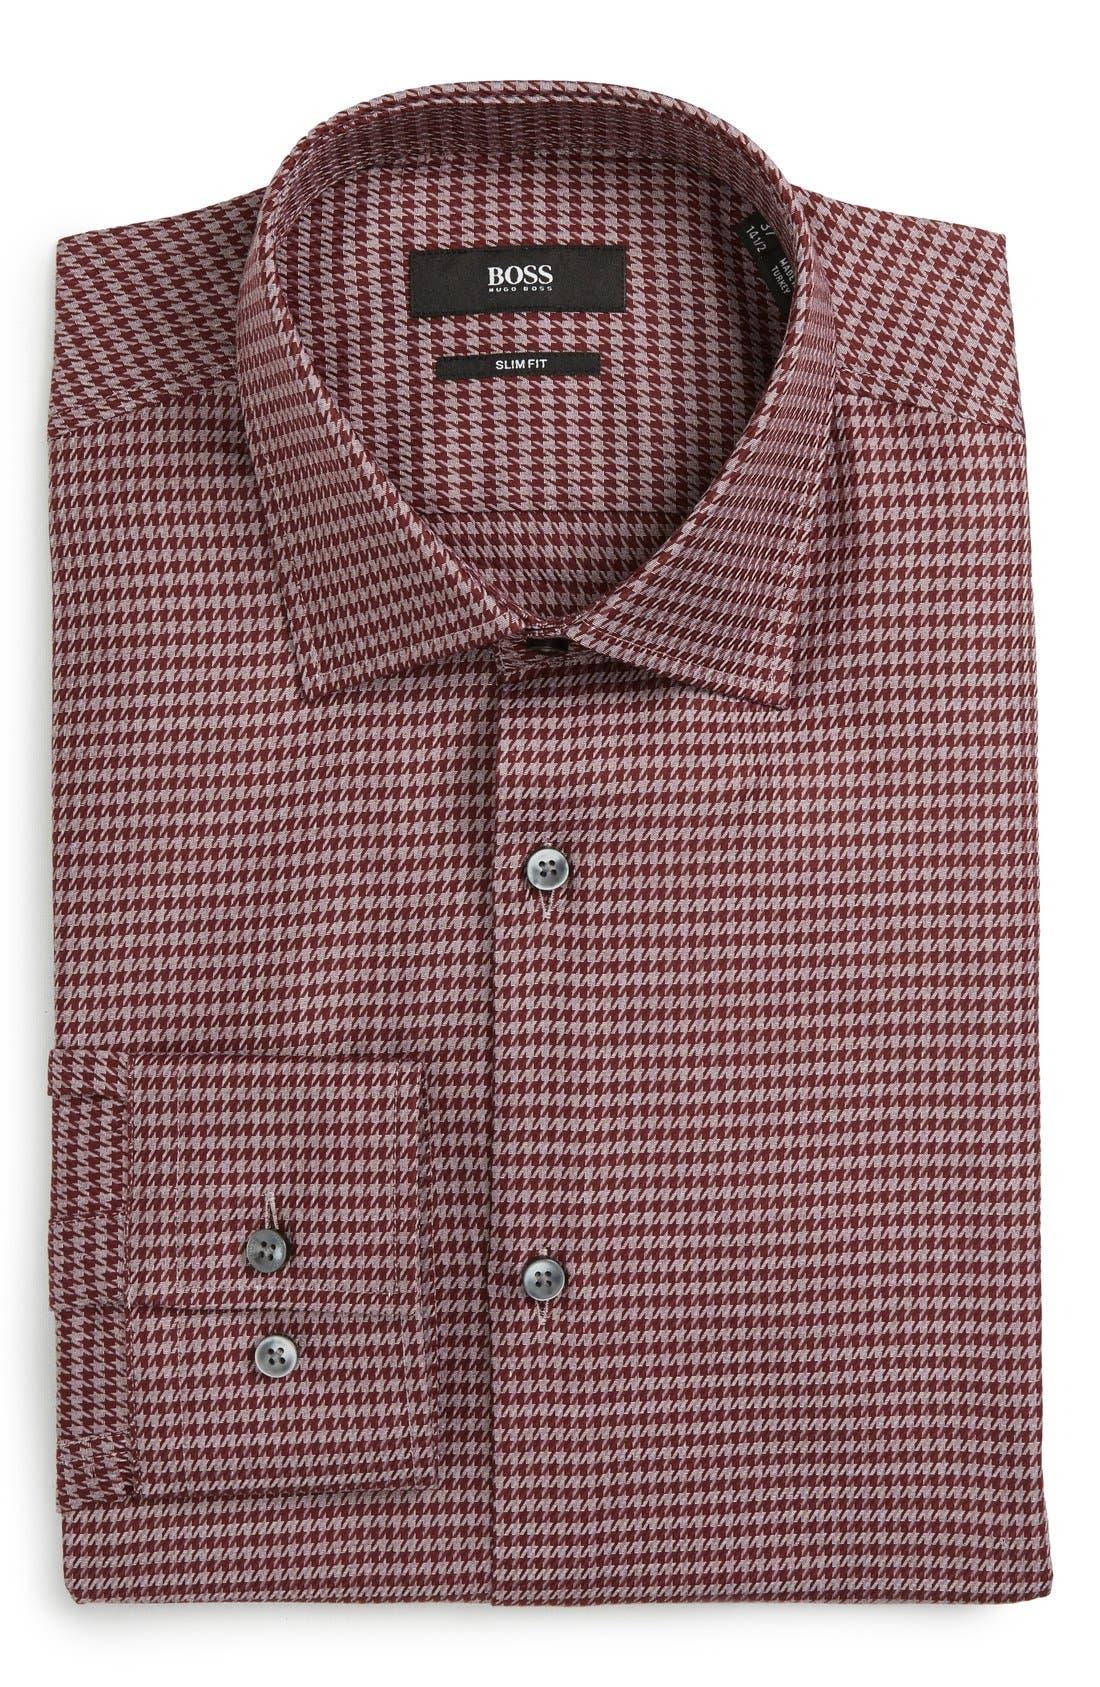 Alternate Image 1 Selected - BOSS Slim Fit Houndstooth Dress Shirt